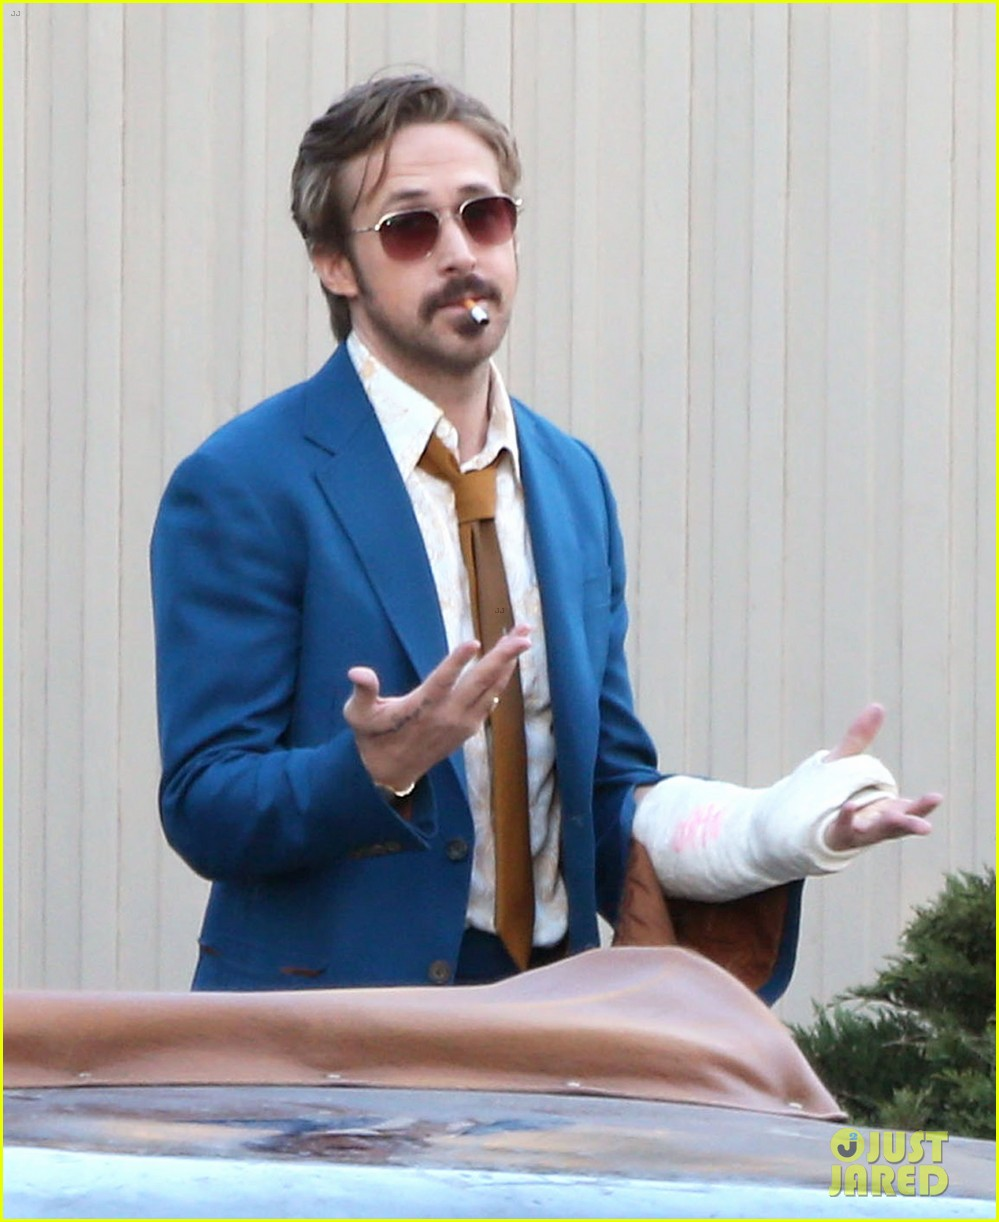 ryan gosling cherishing every minute of fatherhood 07